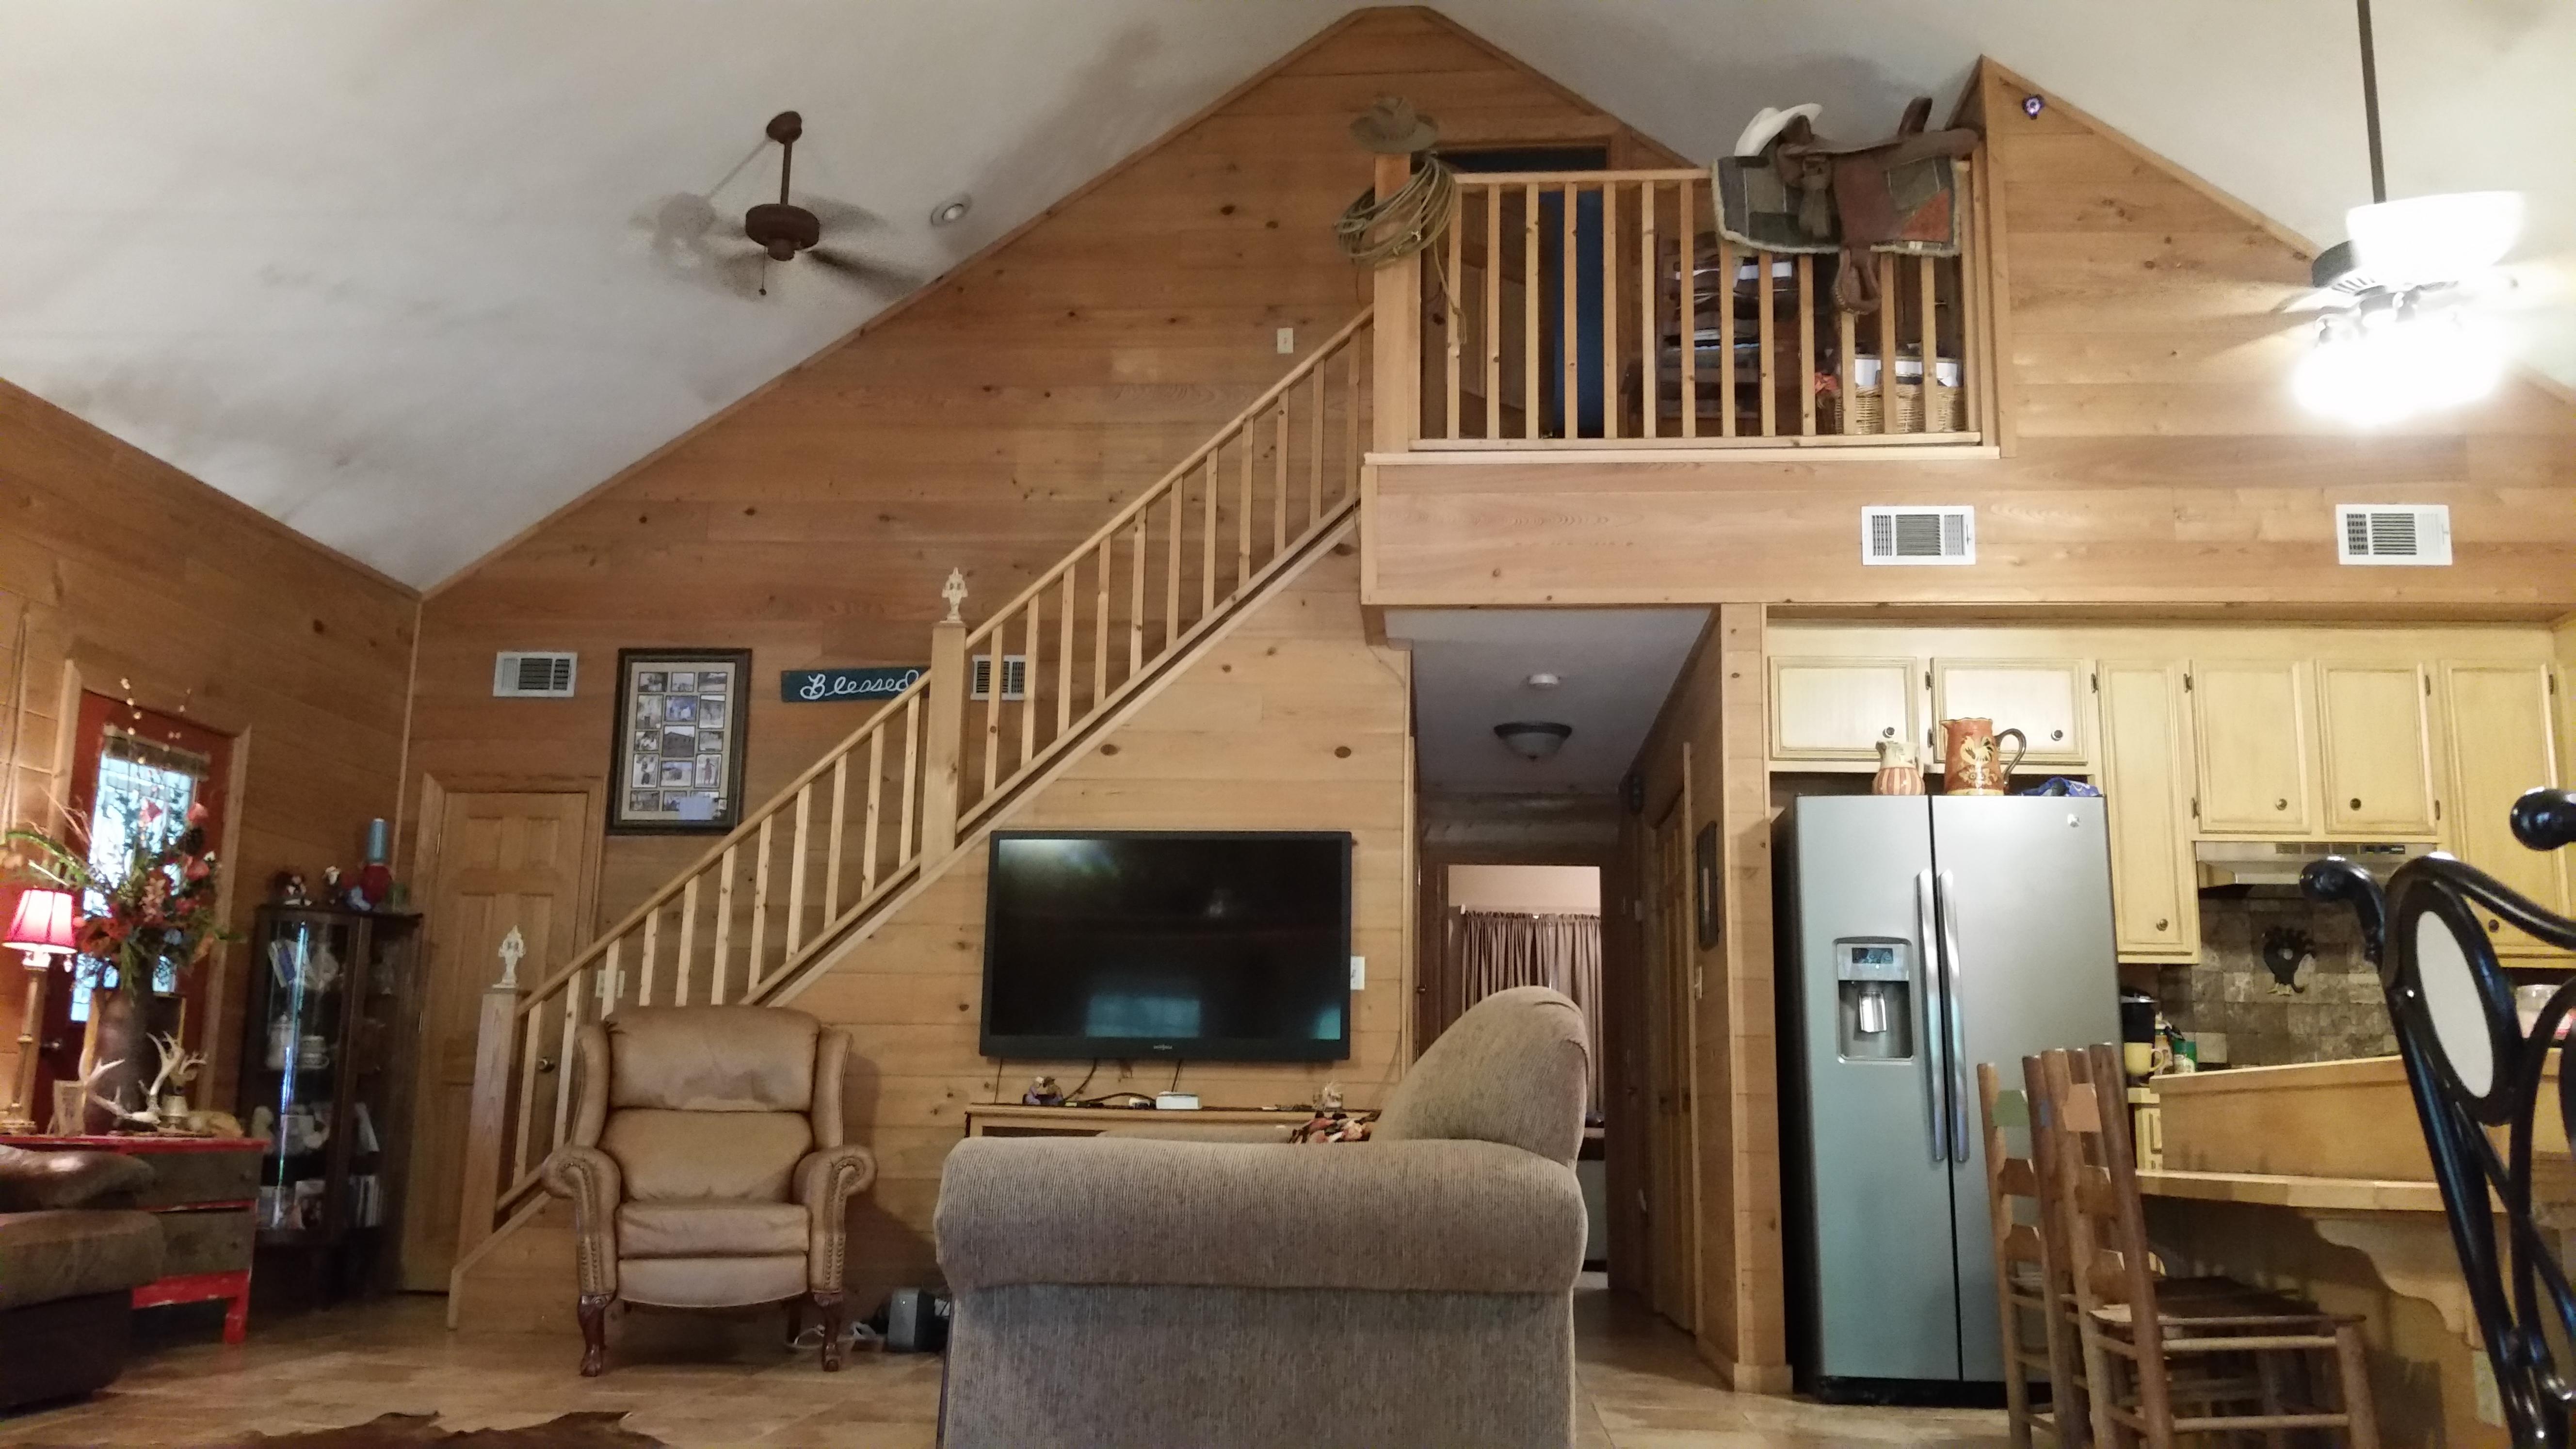 2 68 acre rustic retreat for sale in brandon ms